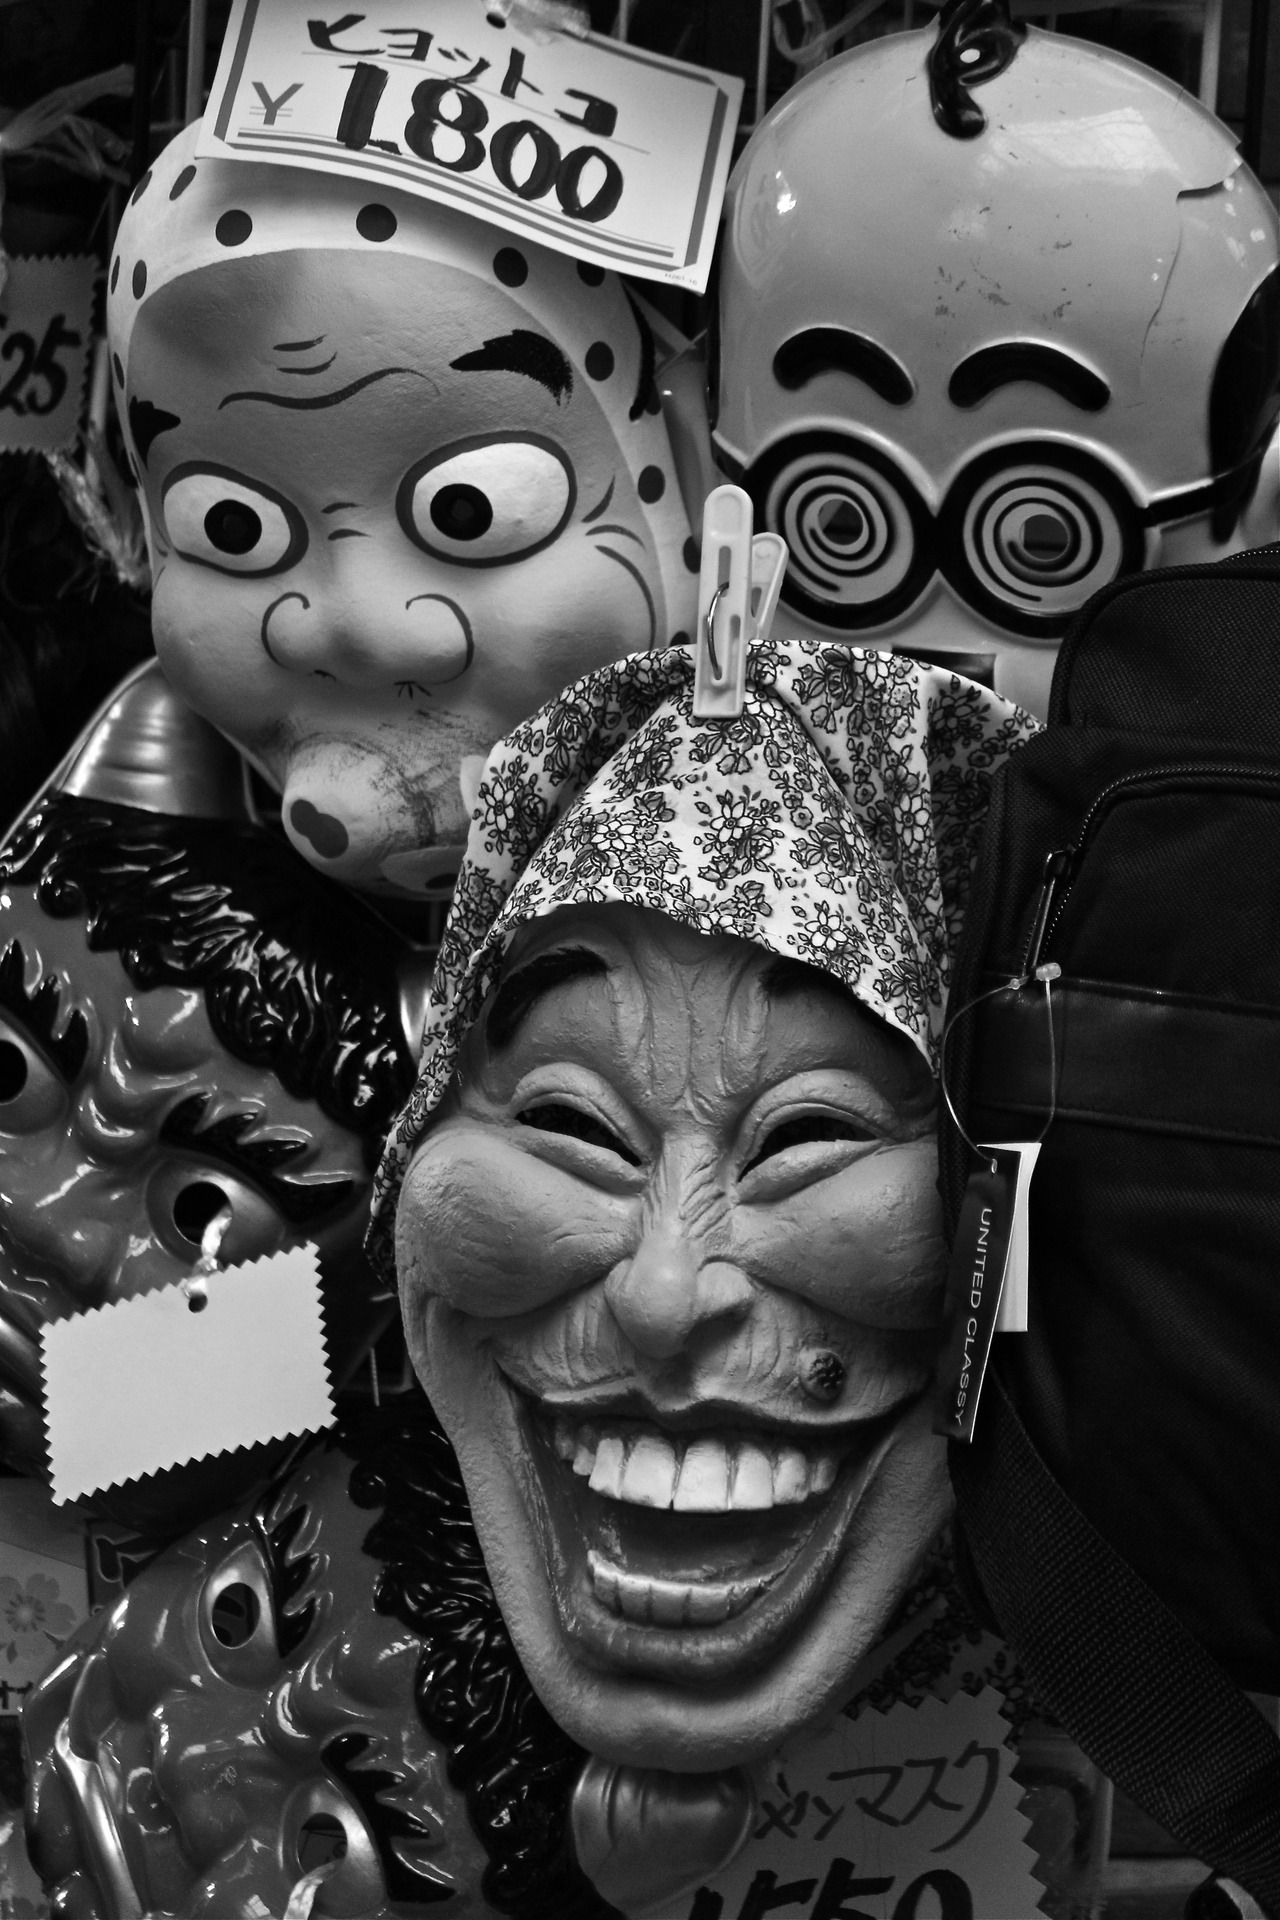 Japanese masks for sale in Asakusa, Tokyo. Photo by hawkeye29 on Tumblr, AKA Motographer in Japan.